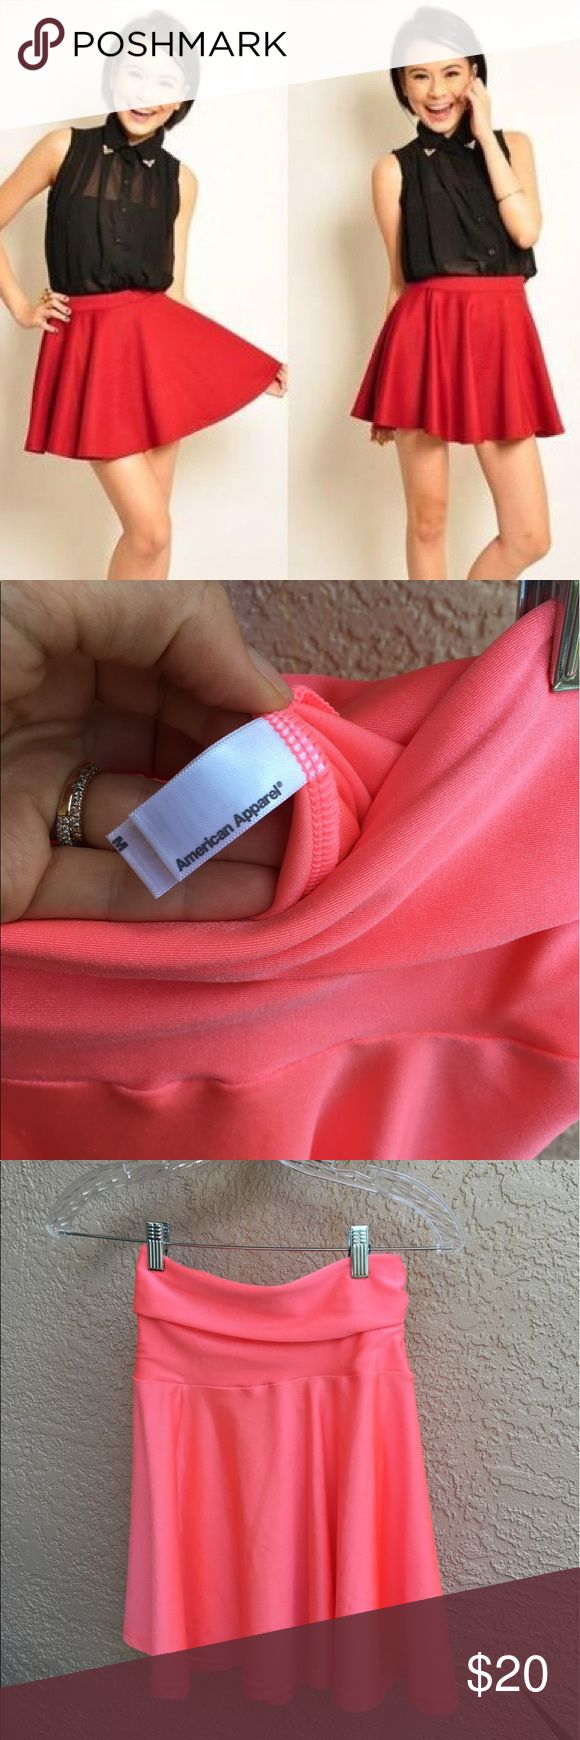 American apparel hot pink skater skirt American apparel hot pink skater skirt size M American Apparel Skirts Midi